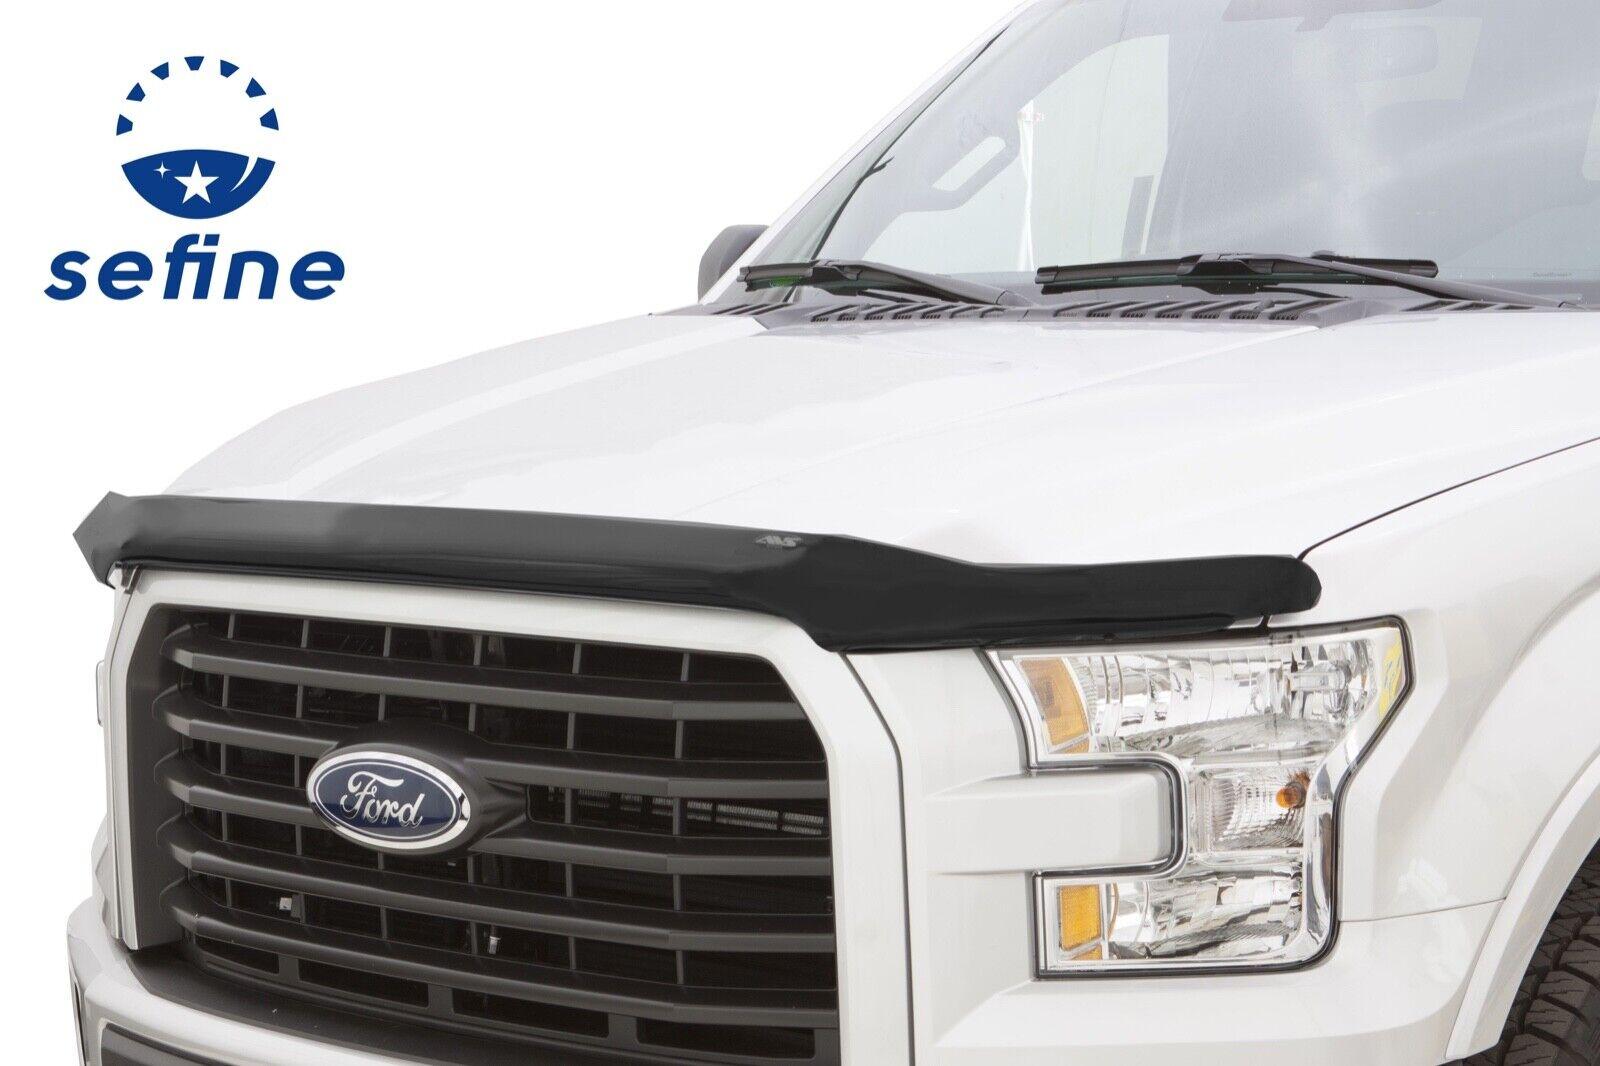 Fits Ford F150 2015-2019 AVS Hoodflector Smoked Bug Shield Hood Deflector